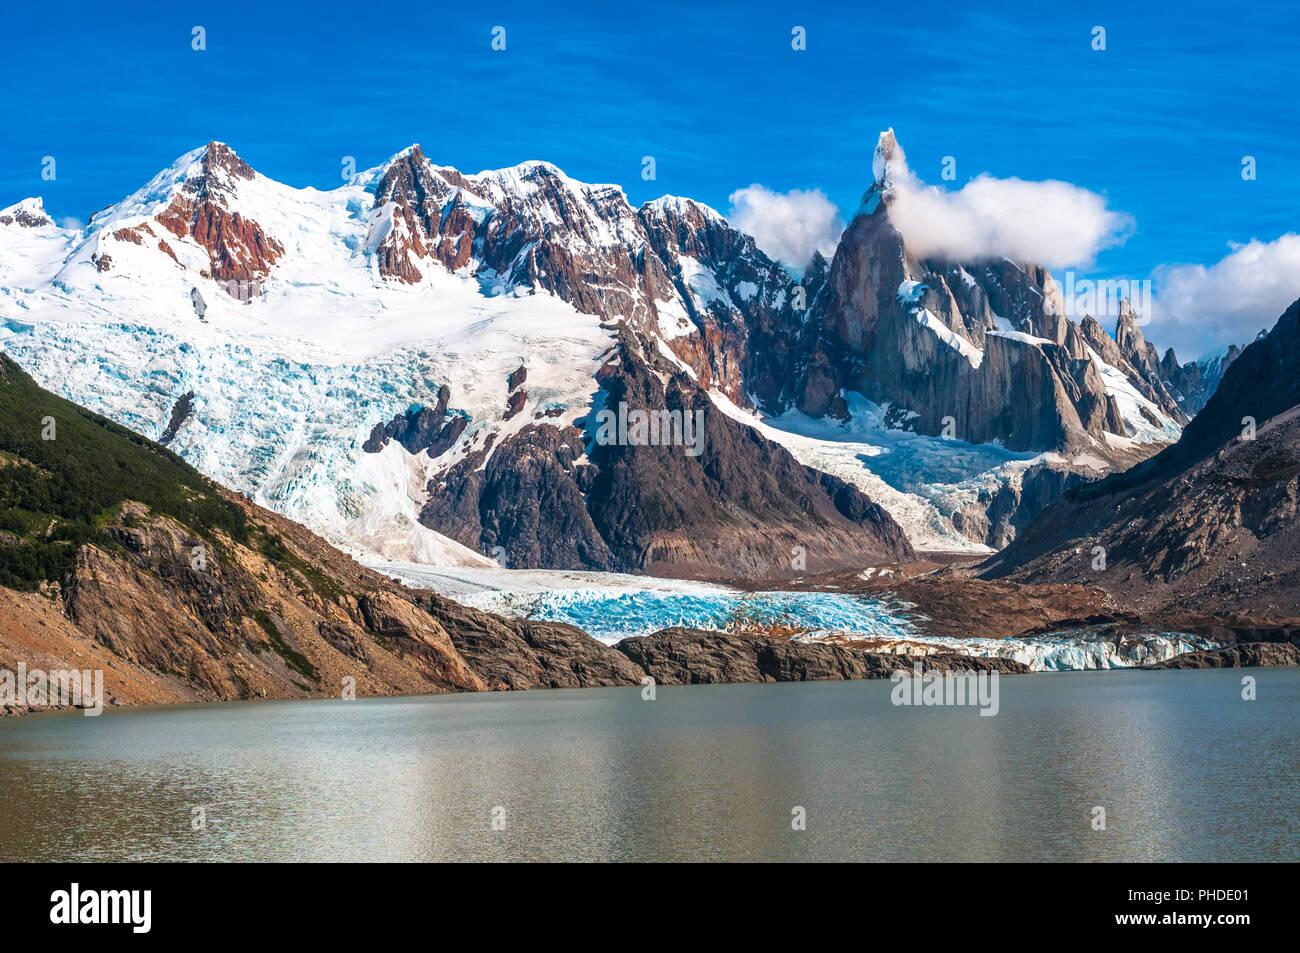 La montagne du Cerro Torre, en Patagonie, Argentine Photo Stock